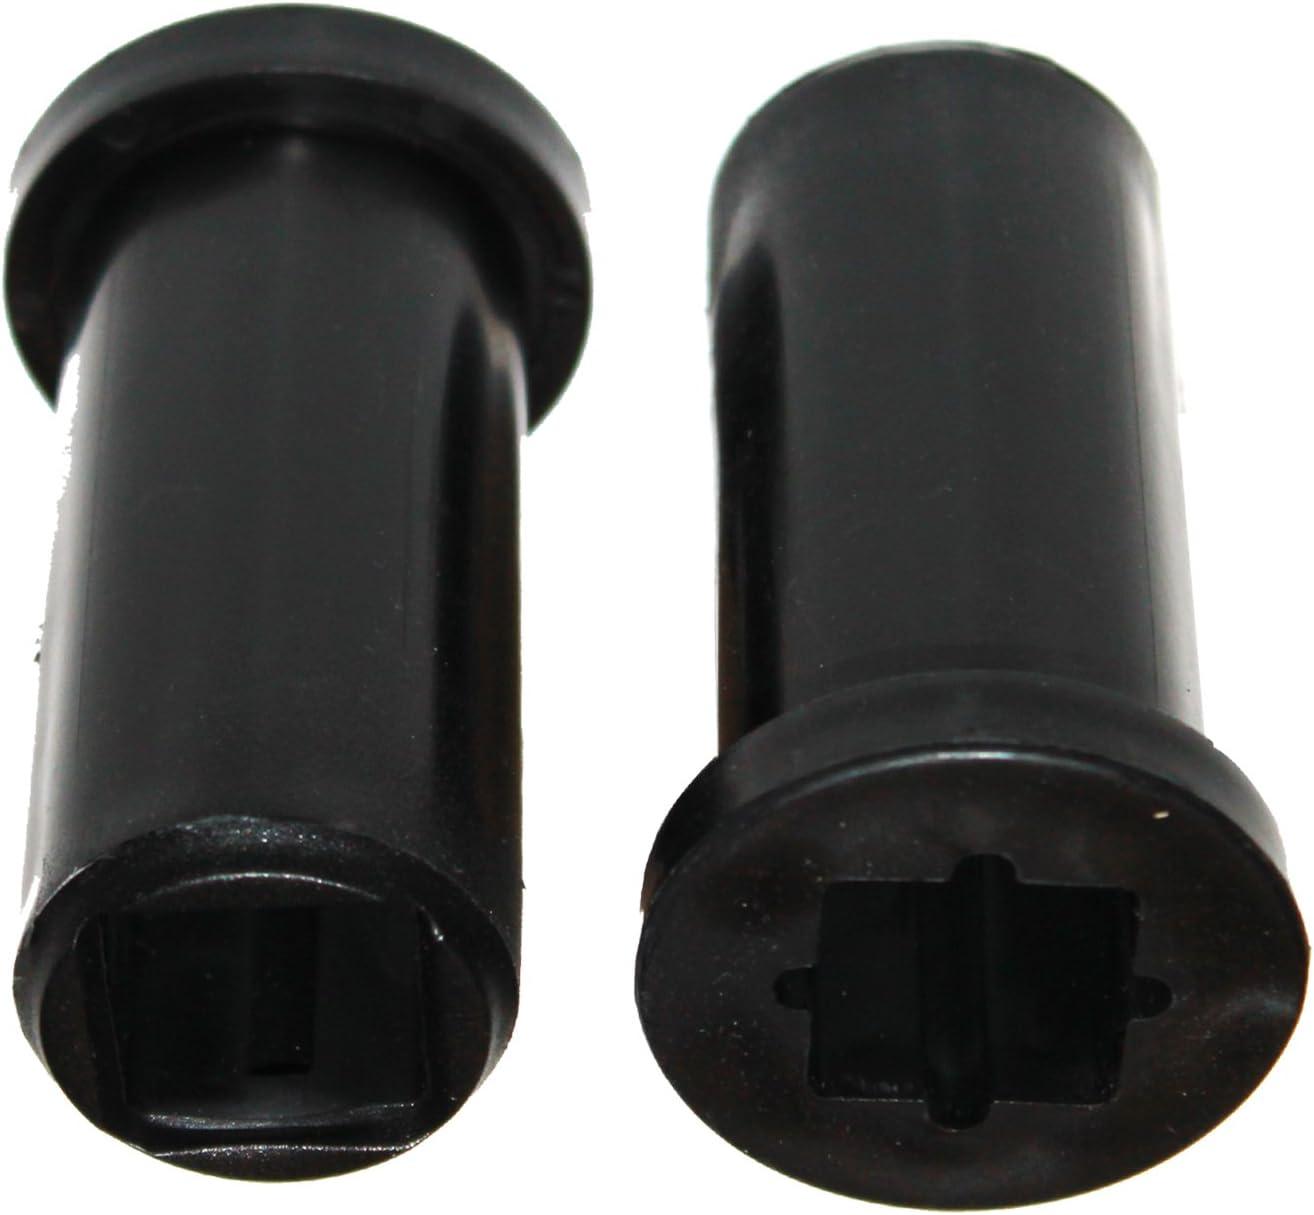 REAR SUSP STABILIZER TUBE BUSHINGS Fits POLARIS SPORTSMAN 400 4x4 2001-2005